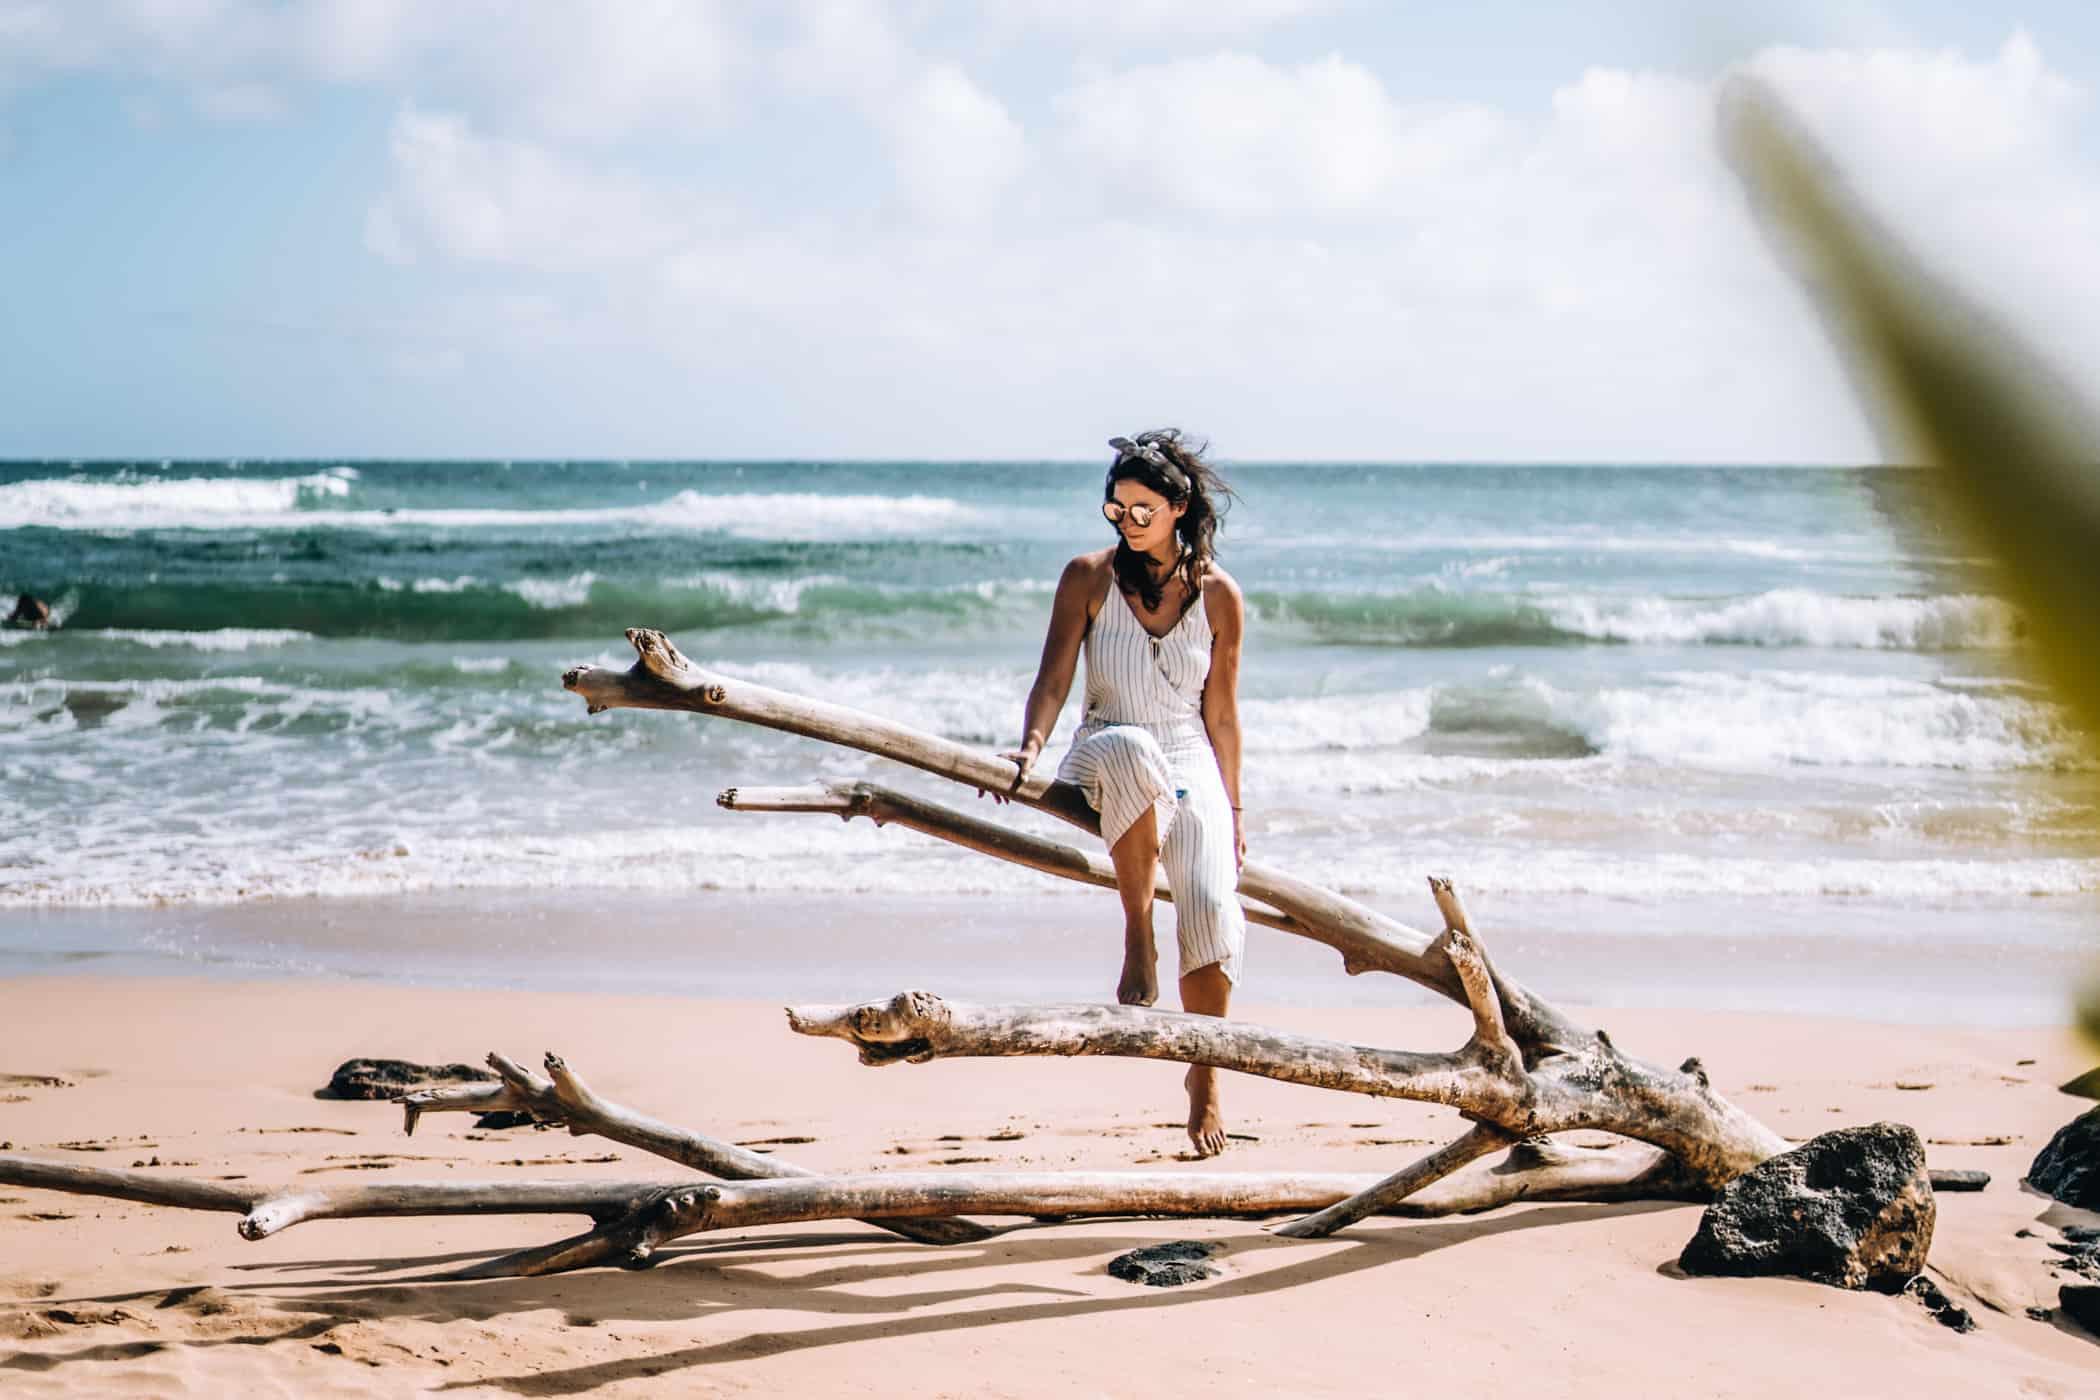 Kauai - Strände, Wandern & Ausflugsziele: Die Garteninsel von HawaiiKauai - Strände, Wandern & Ausflugsziele: Kapaa Beach Park